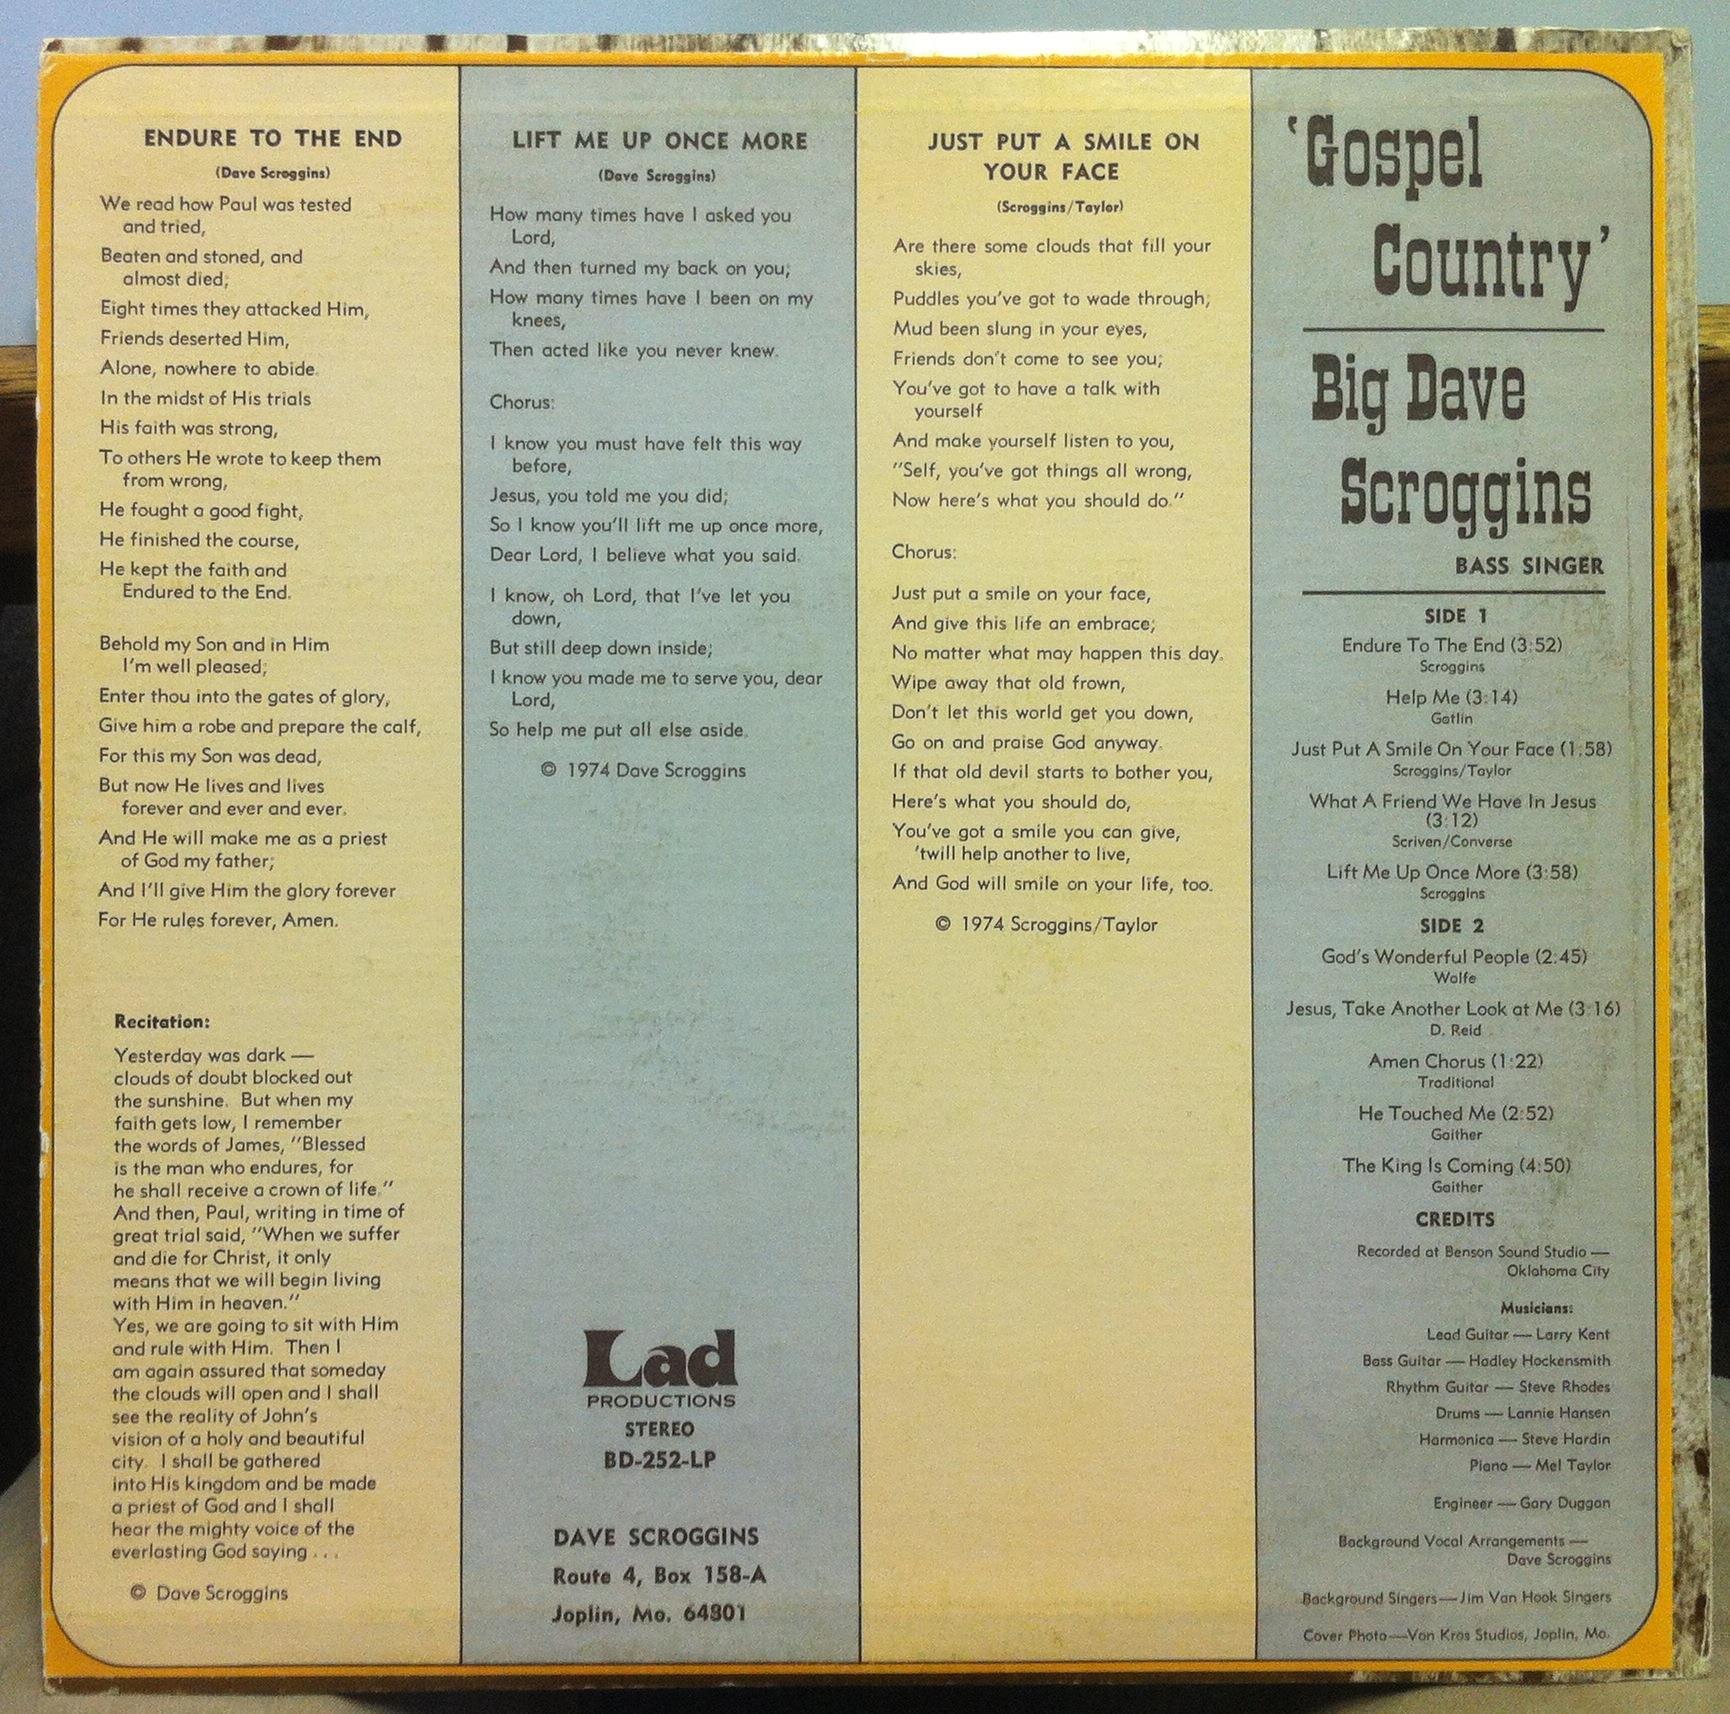 Gospel country by Big Dave Scroggins, LP with shugarecords